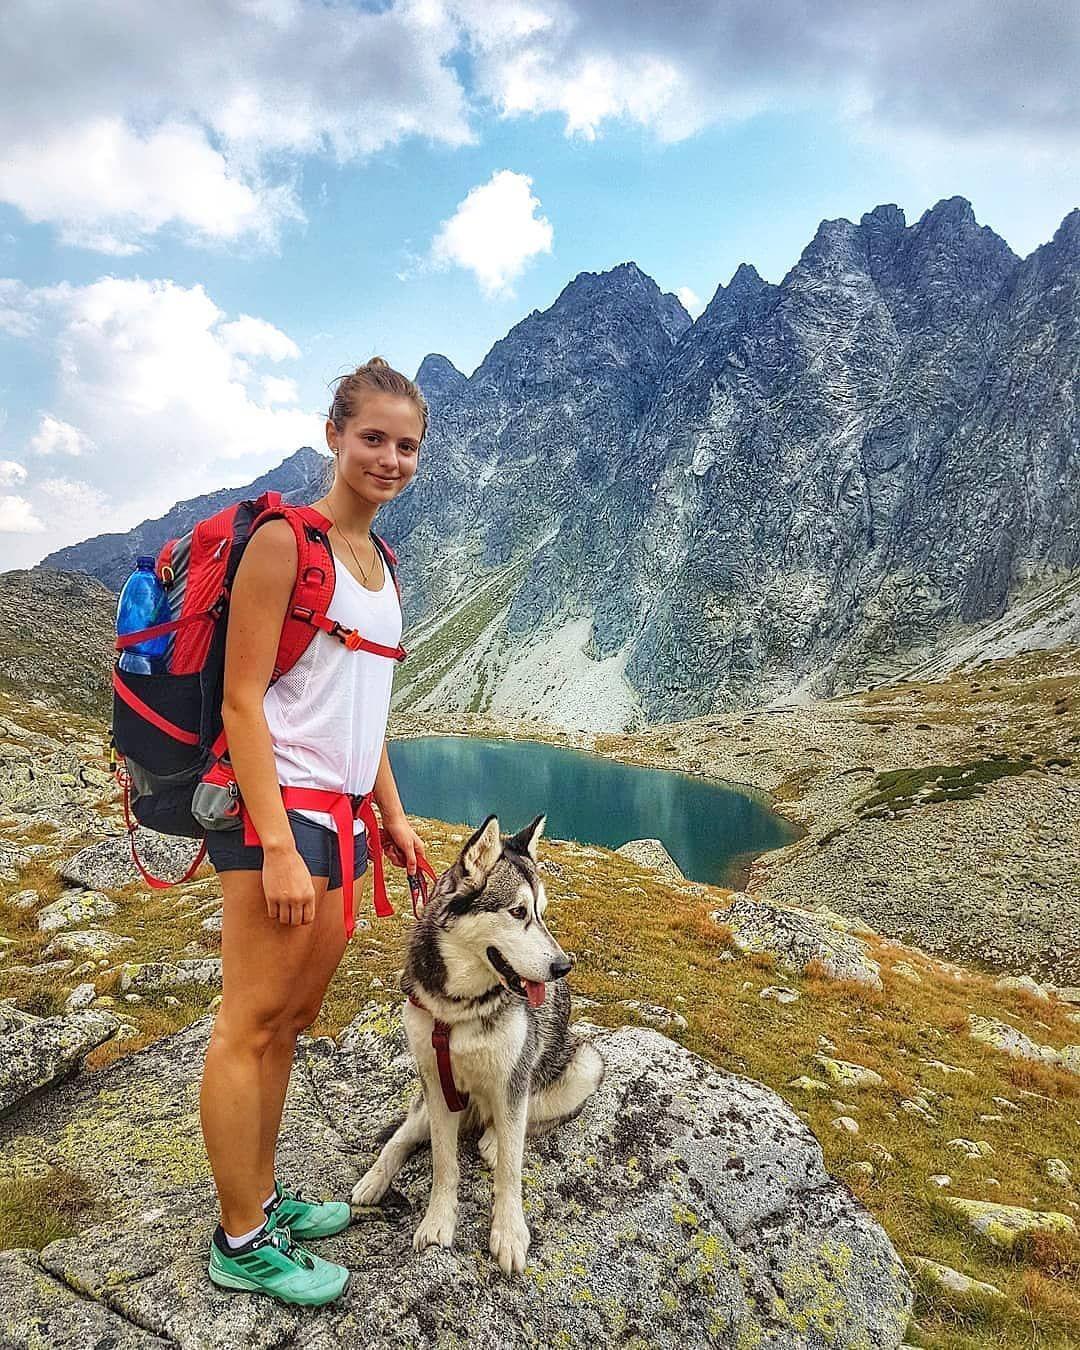 Follow 🌲🏜 @Geardoctors ⛰ Get inspired with @geardoctors 🗺 Follow 🌲🏜 @Geardoctors ⛰ . All thanks to @vevuskat wonderful Shot 📸 . . . . #turistika #turistikanaslovensku #praveslovenske #puresvk #pureslovakia #thisisslovakia #slovakia #slovakianature #slovakadventures #horyapriroda #hiking #nature #slovakwild #milujemehory #horskyholky #slovakianaturehd #zenyvhorach #nature #hightatras #tatrasadventures #tatrymountains #memories #missing #alaskanmalamute - #regrann